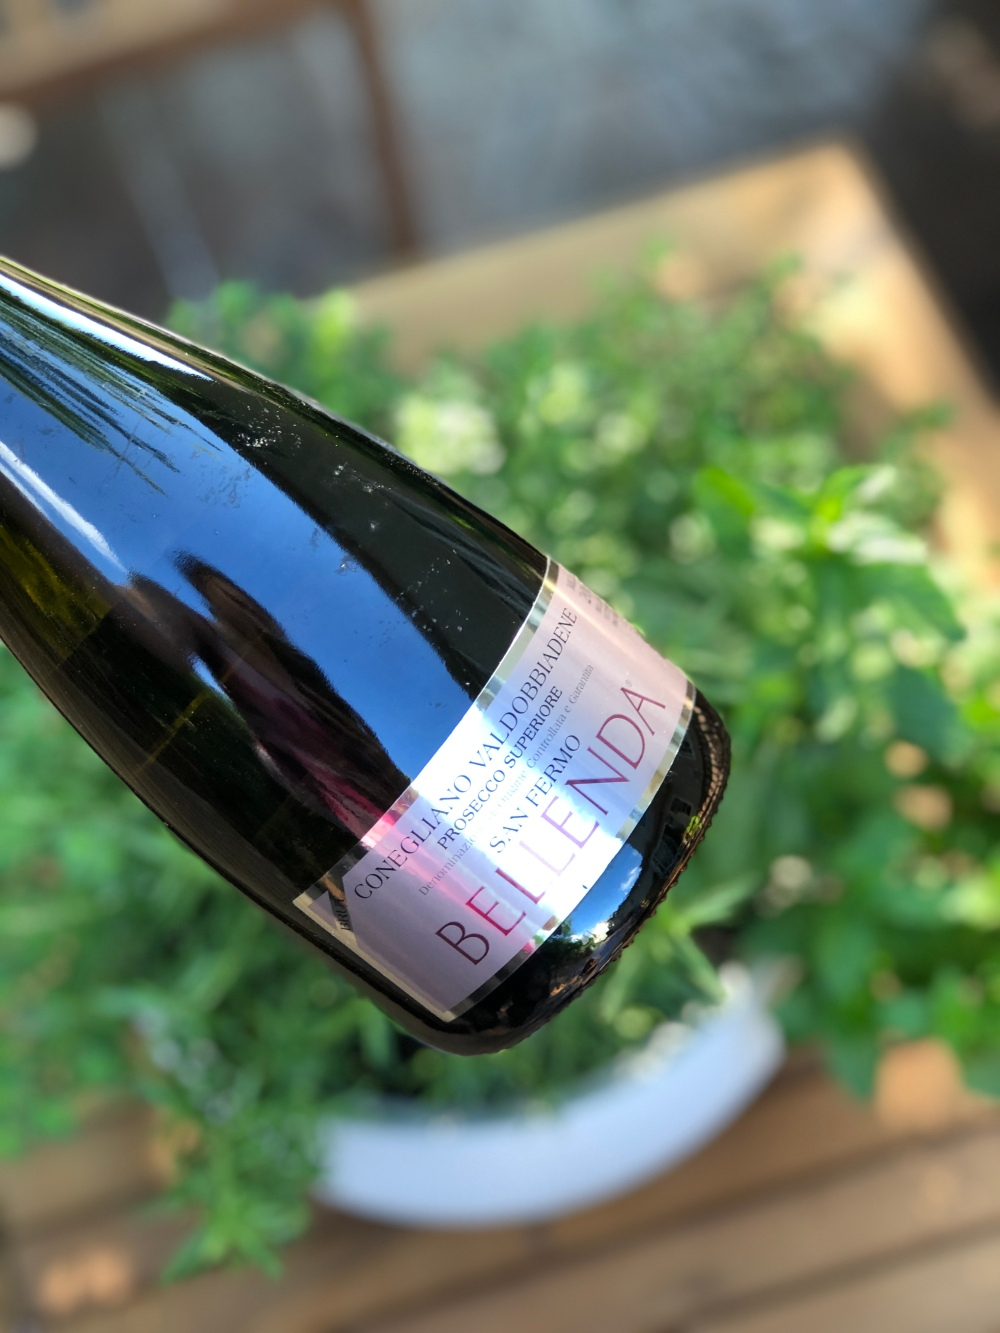 bubbles for summer, Champagne vs Prosecco, what is Prosecco